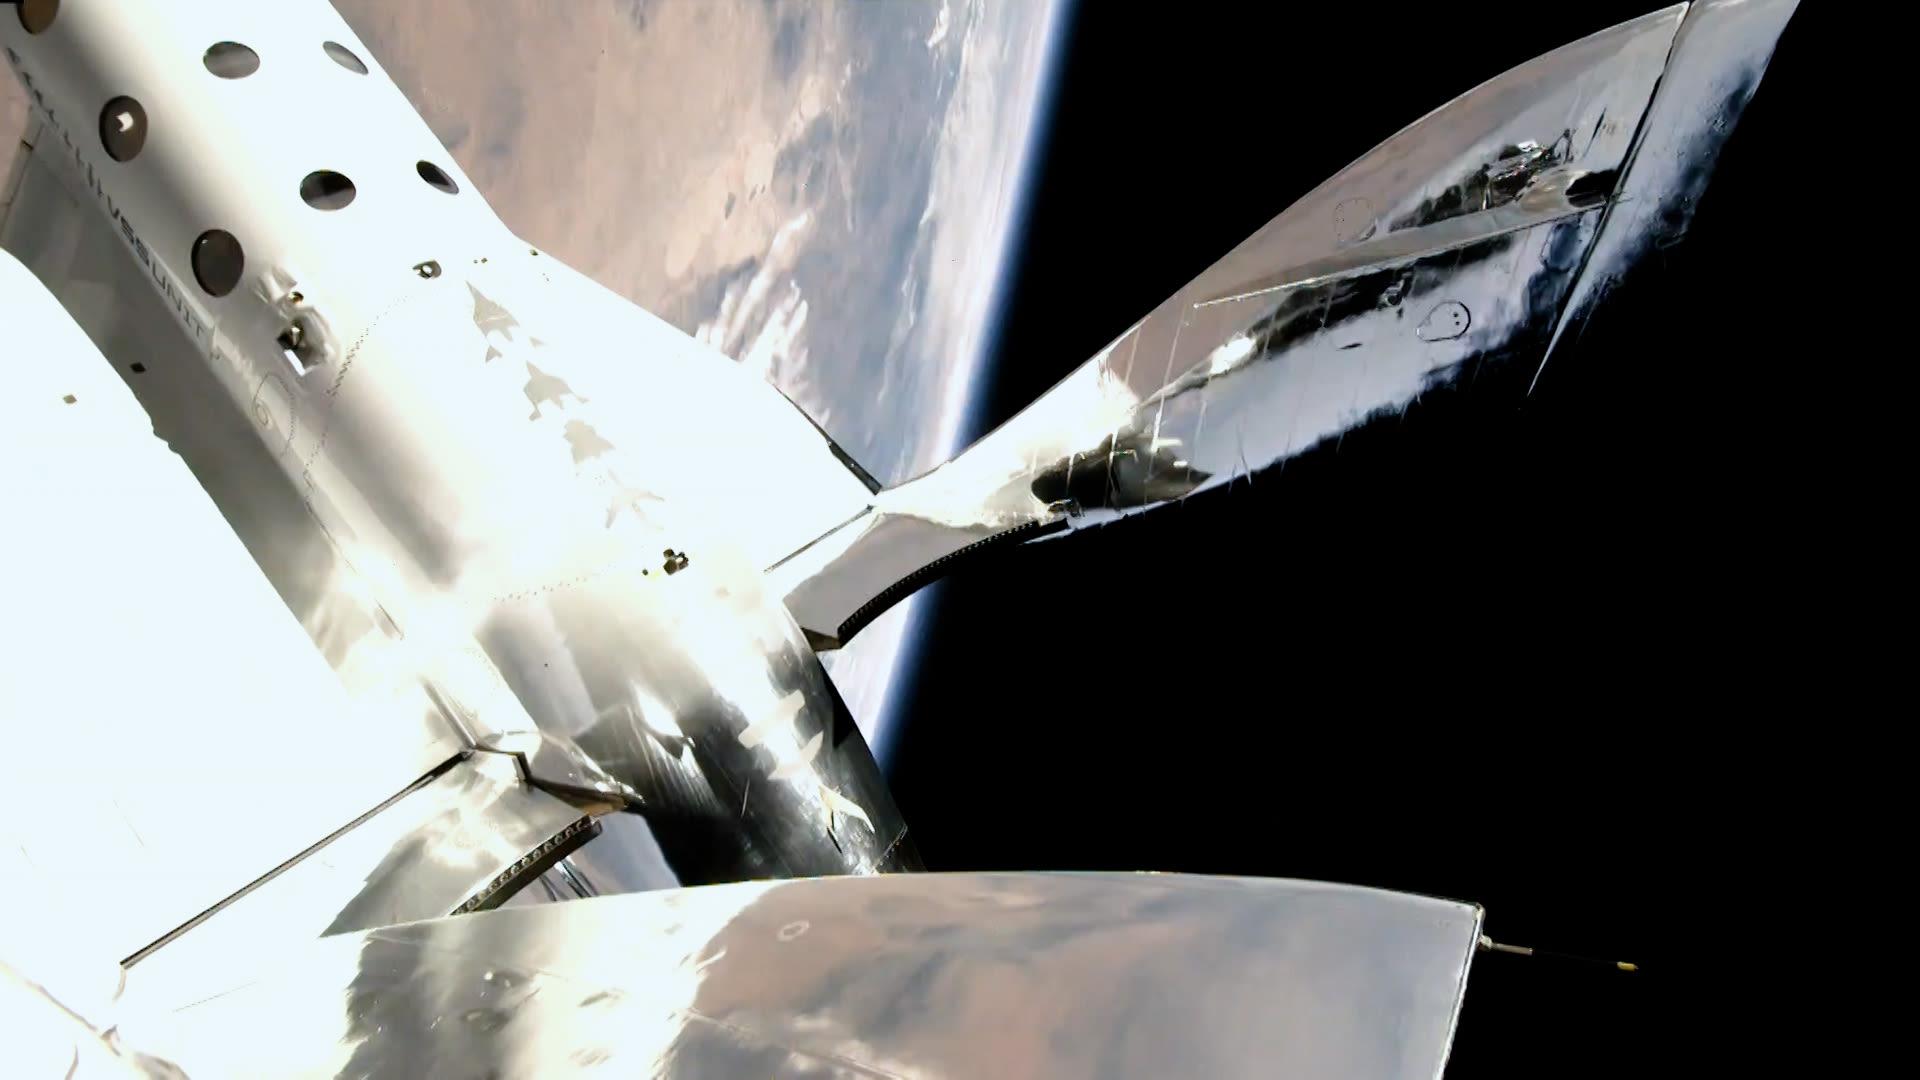 Richard Branson in space 3